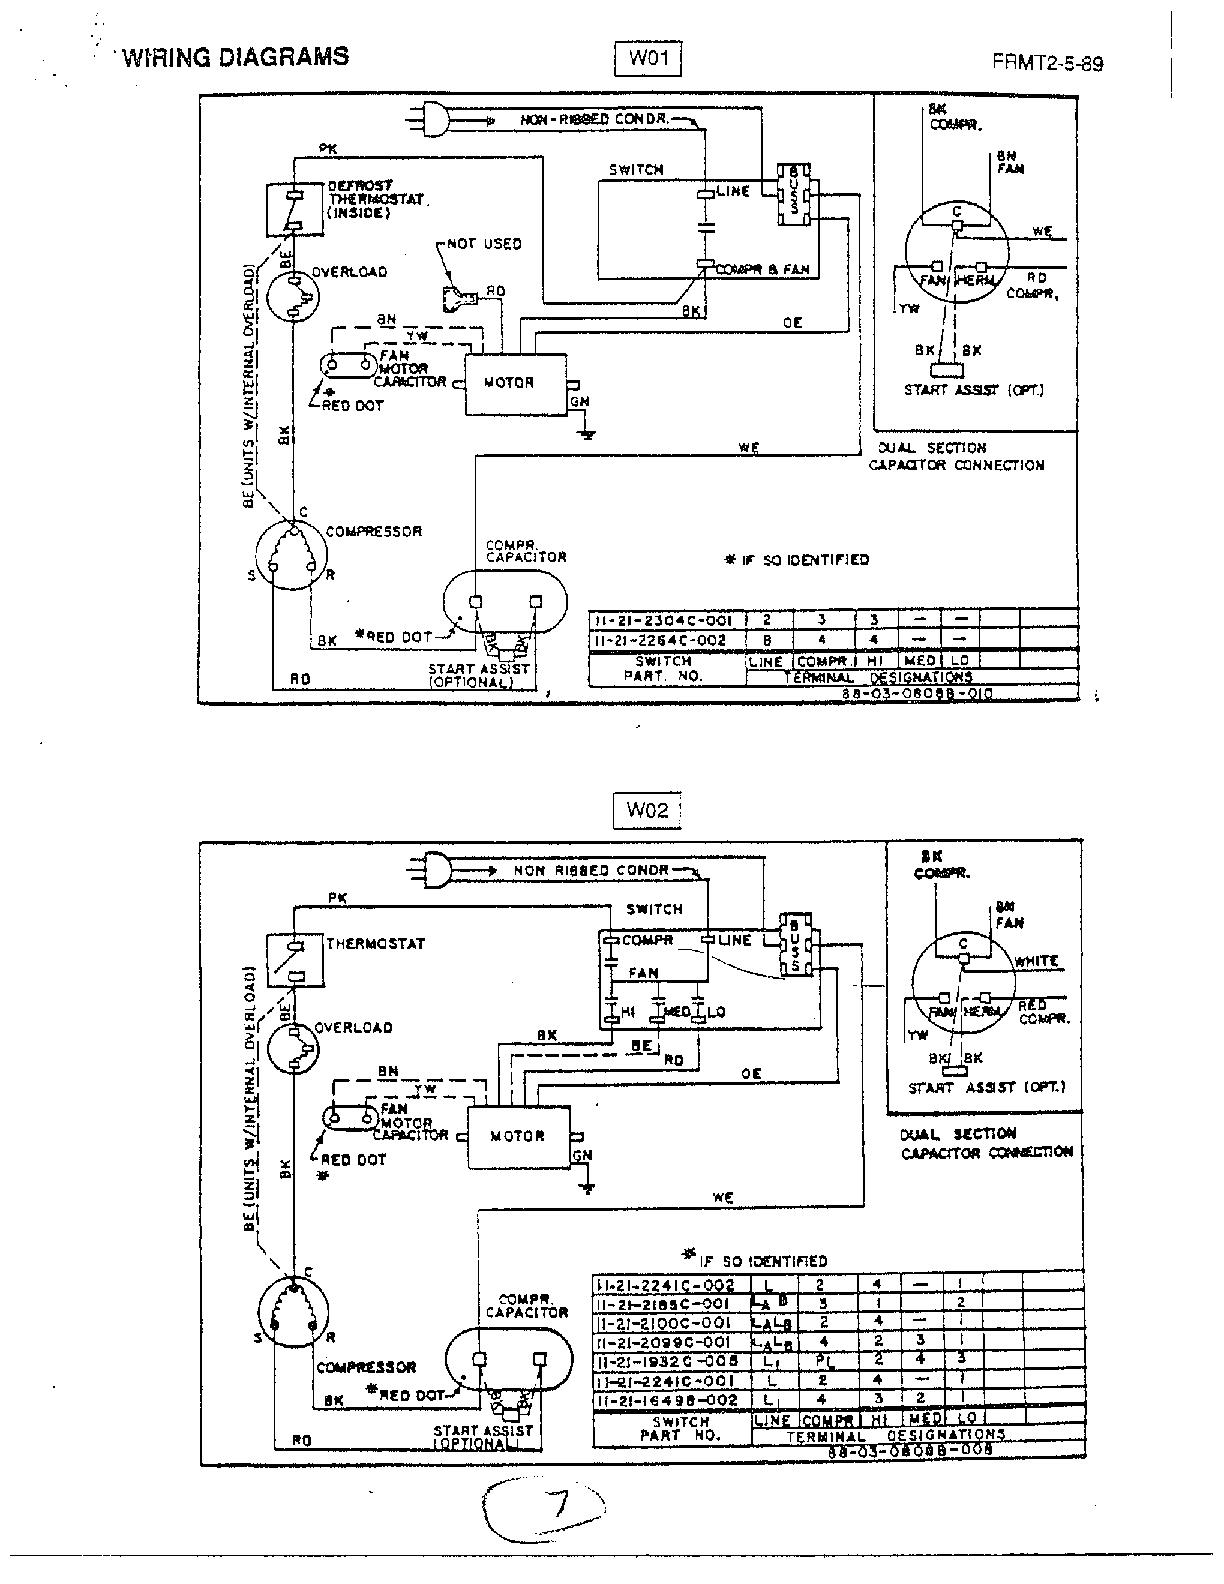 Red Dot Hvac Wiring Schematics - 1974 Johnson 85 Hp Wiring Diagram -  tekonsha.asyikk-masuk1.waystar.fr | Red Dot Ac Unit Wiring |  | Bege Wiring Diagram - Wiring Diagram Resource